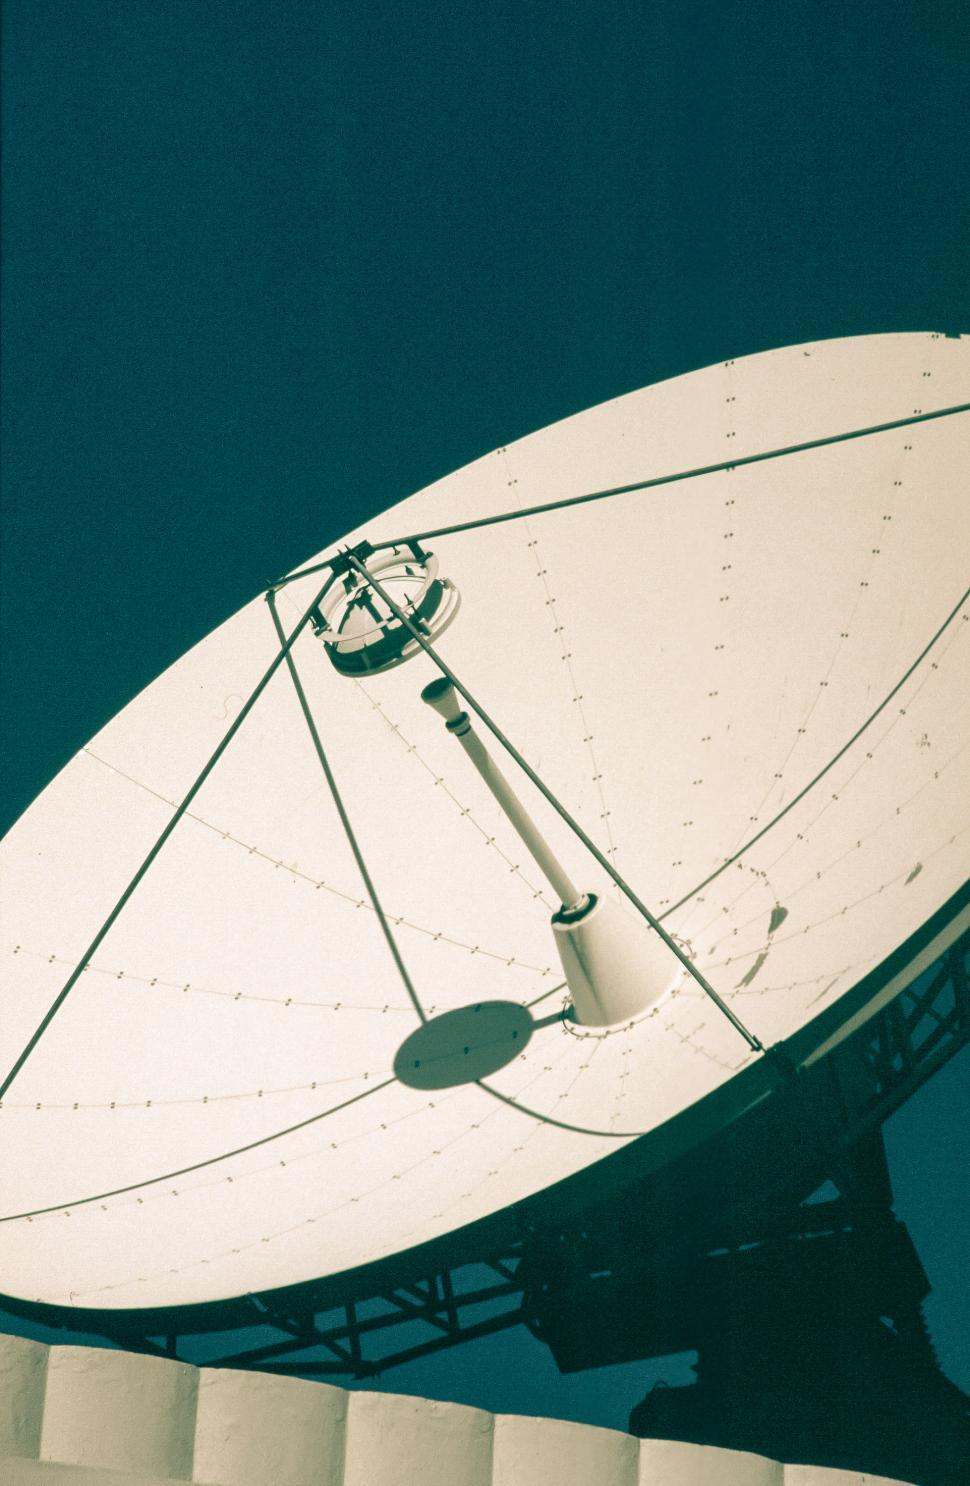 Download Free Stock Photo of Satellite Dish